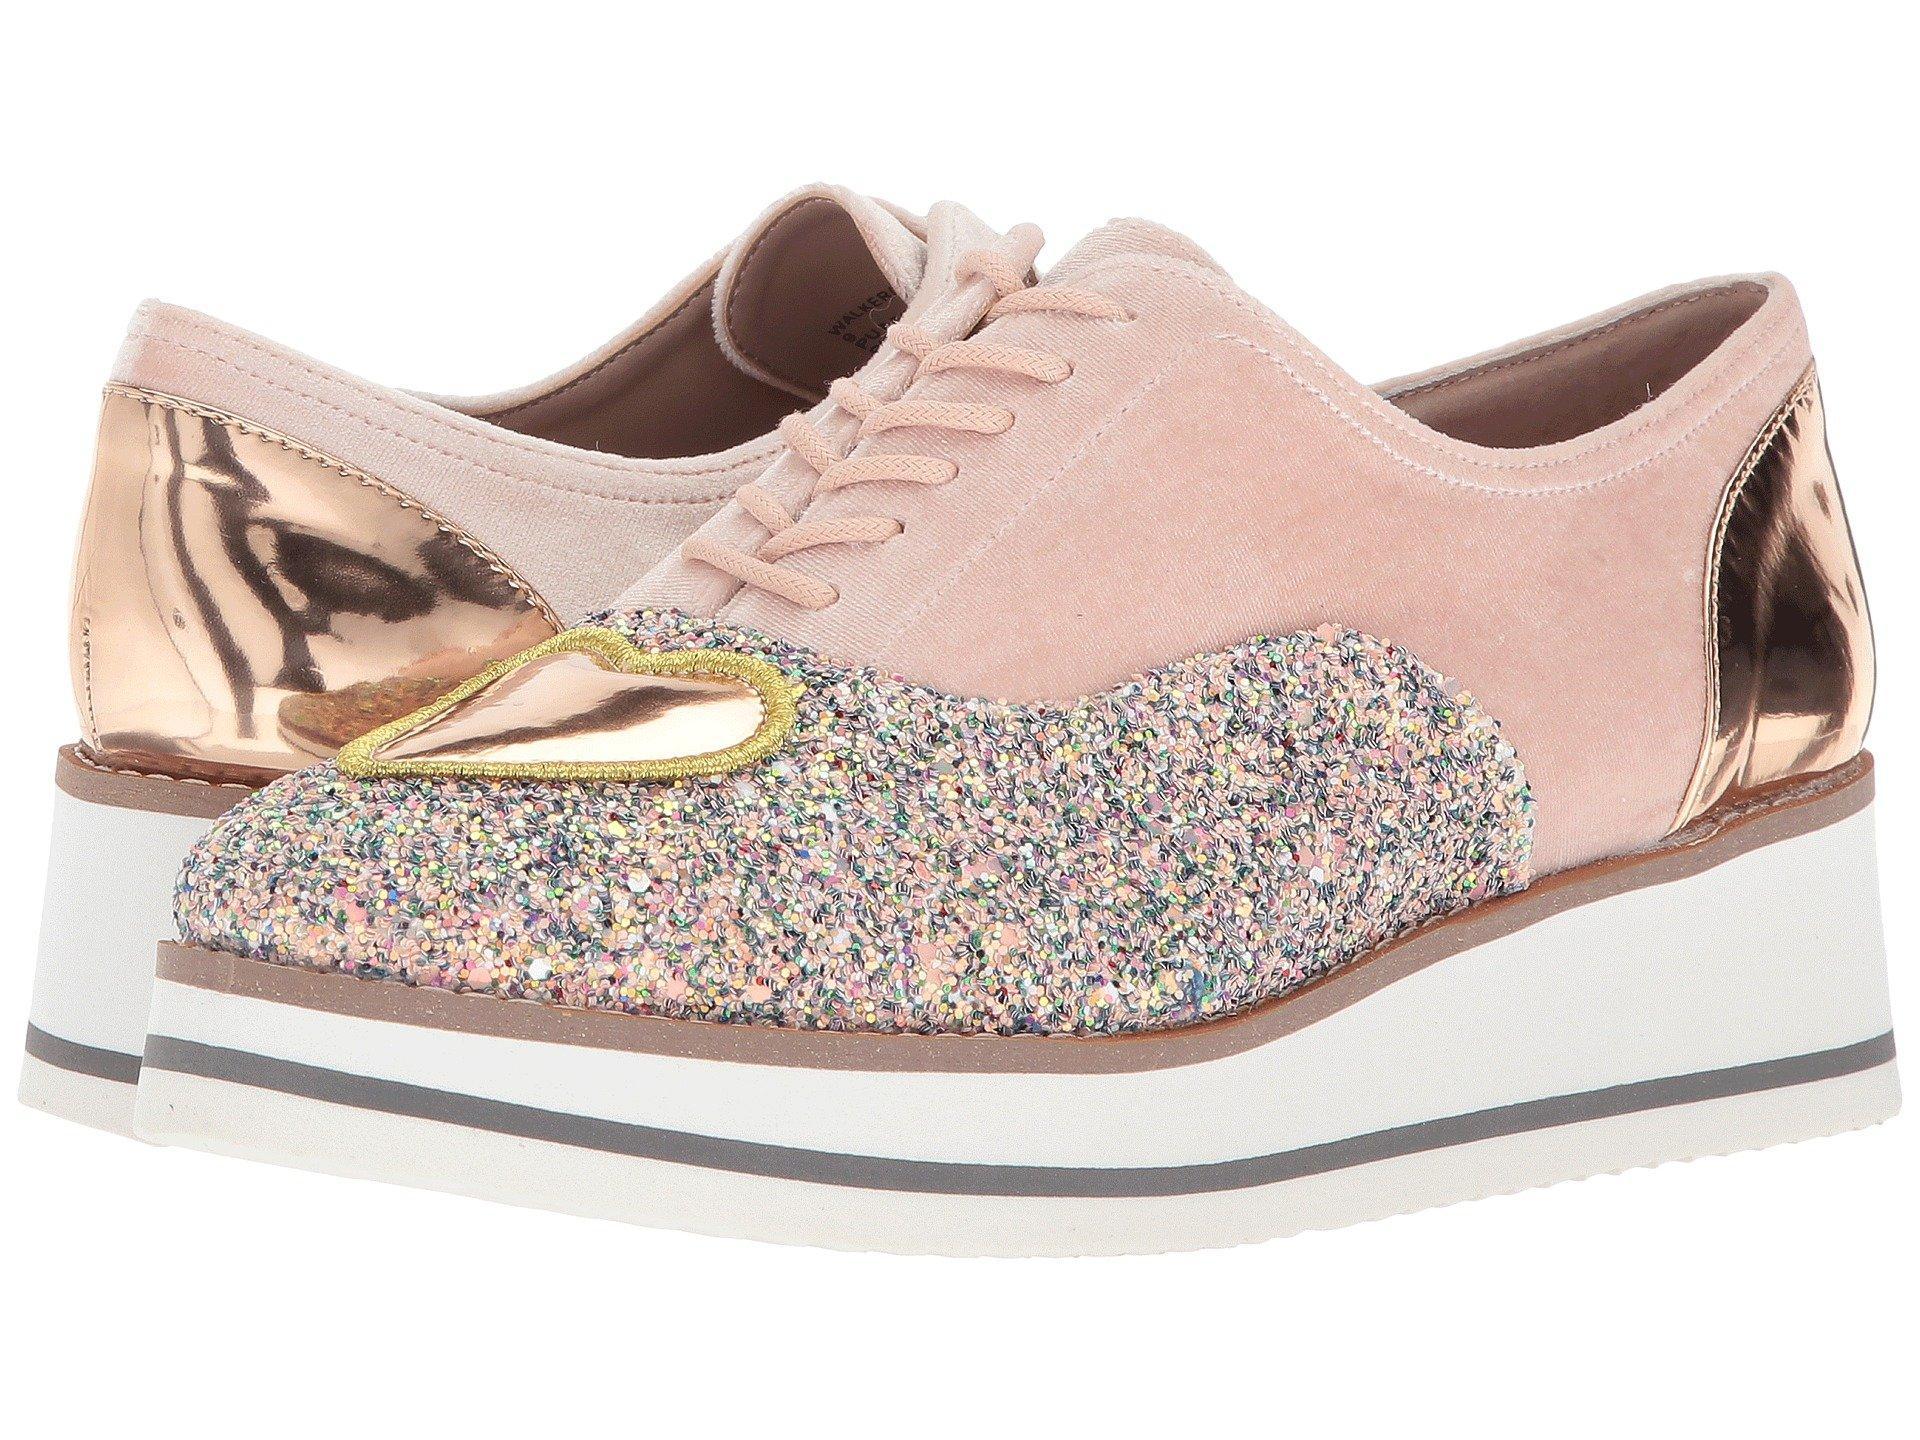 ae9d4716e0e5 Betsey Johnson Walker Embellished Oxfords Women s Shoes In Blush Multi